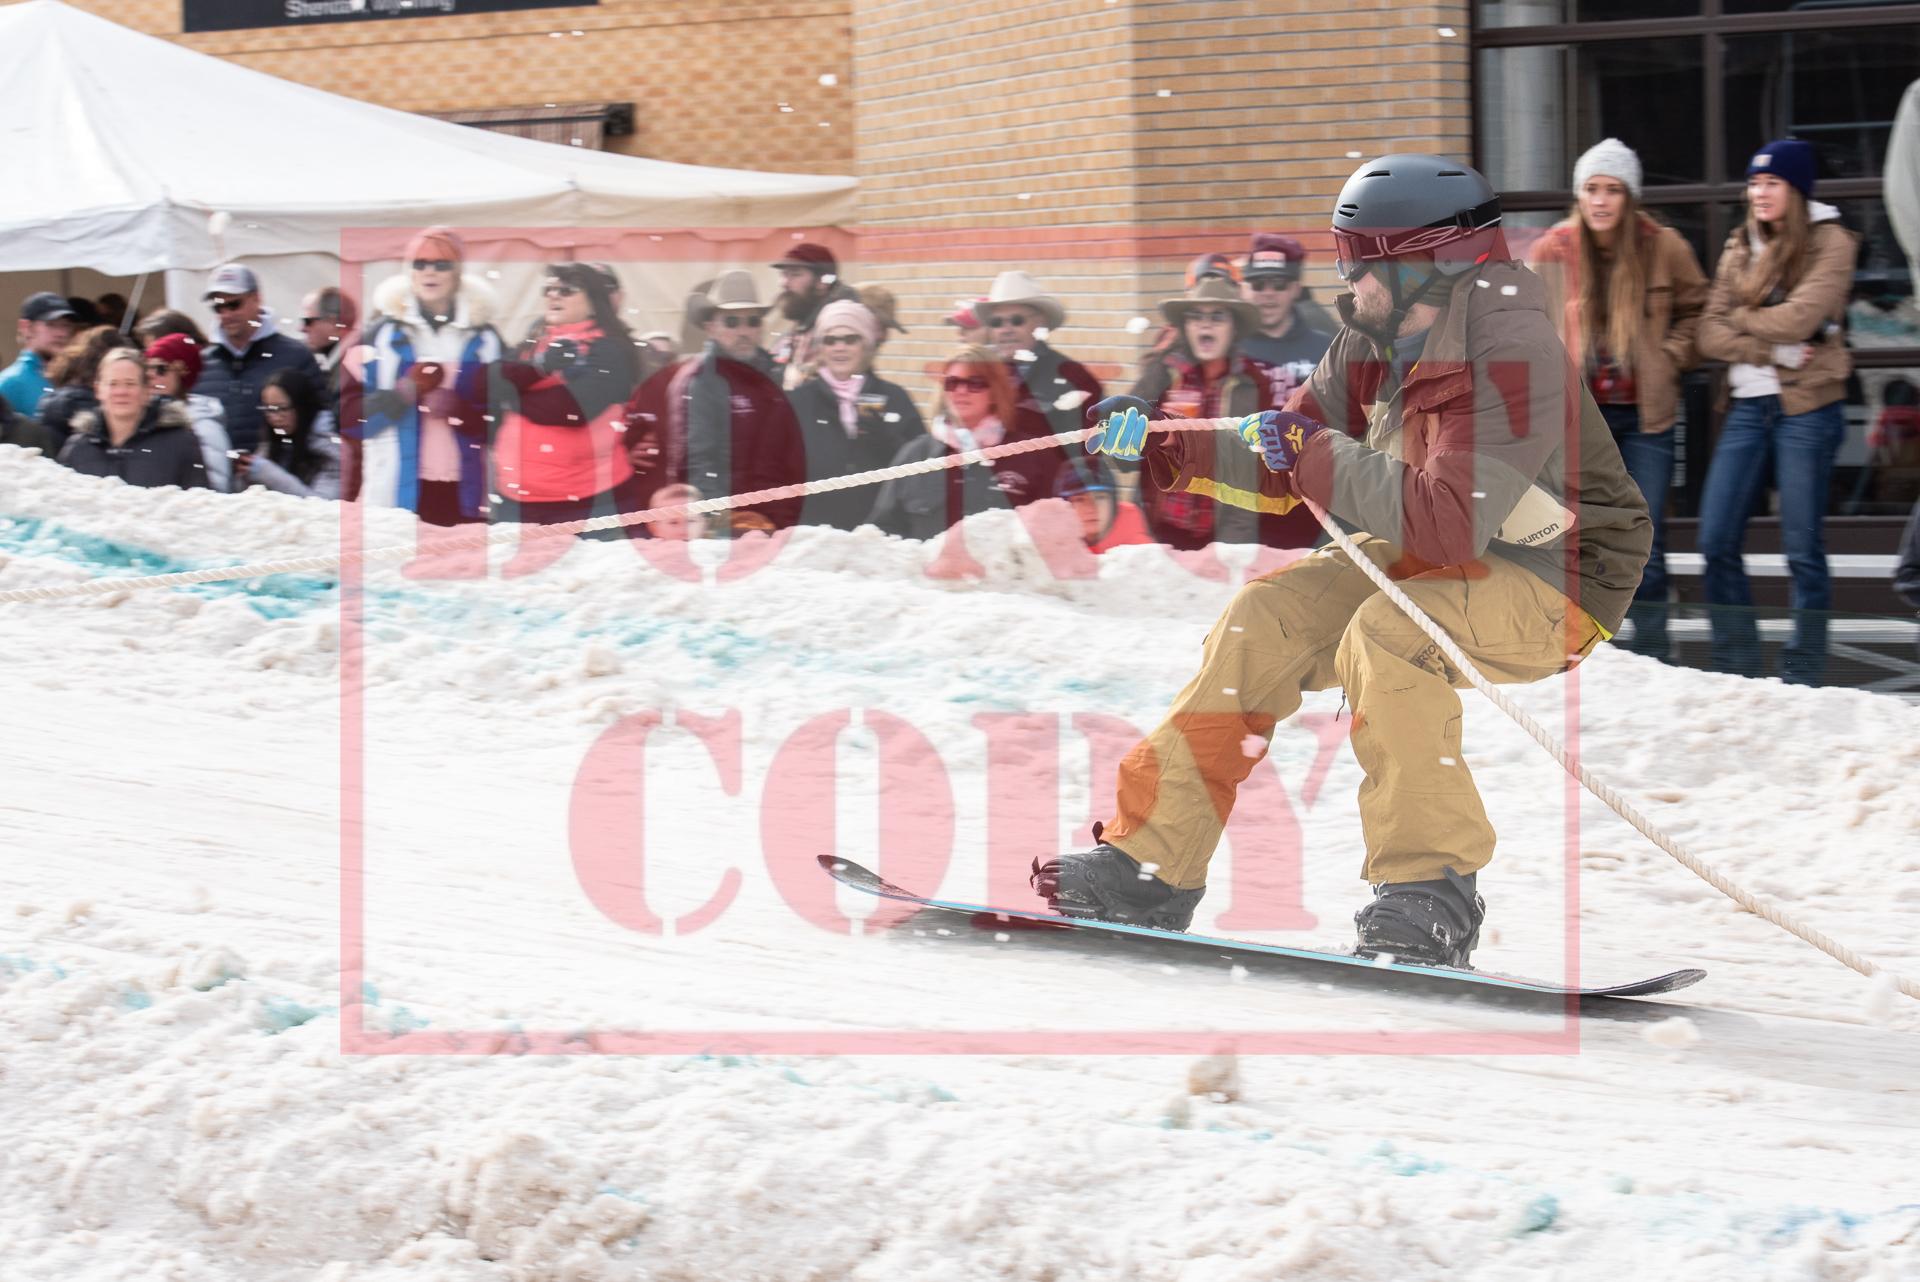 - Chris Sorenson - Snowboard 6